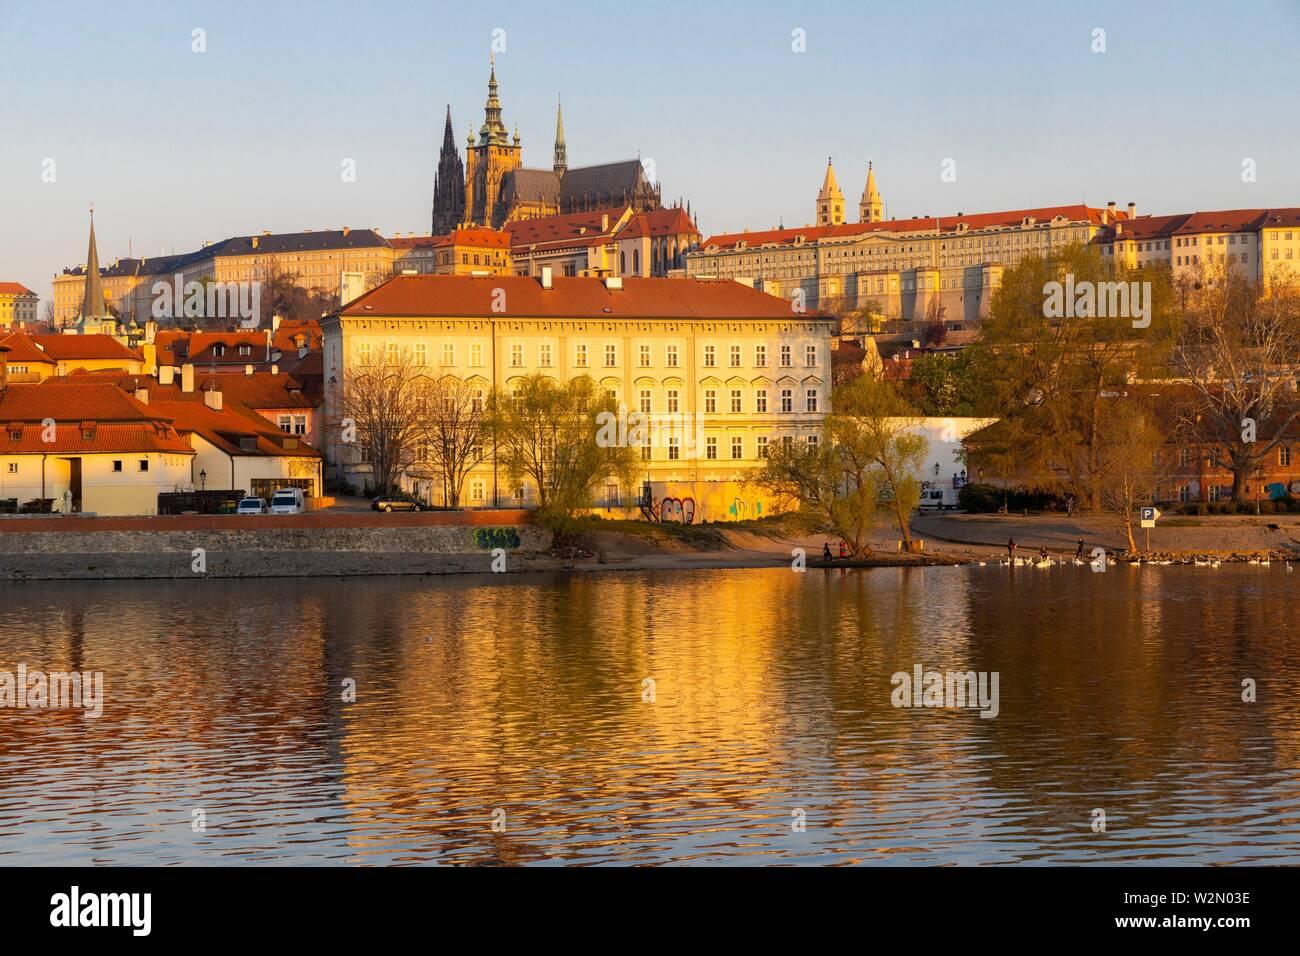 Panorama of Hradcany at sunrise, Czech Republic. - Stock Image